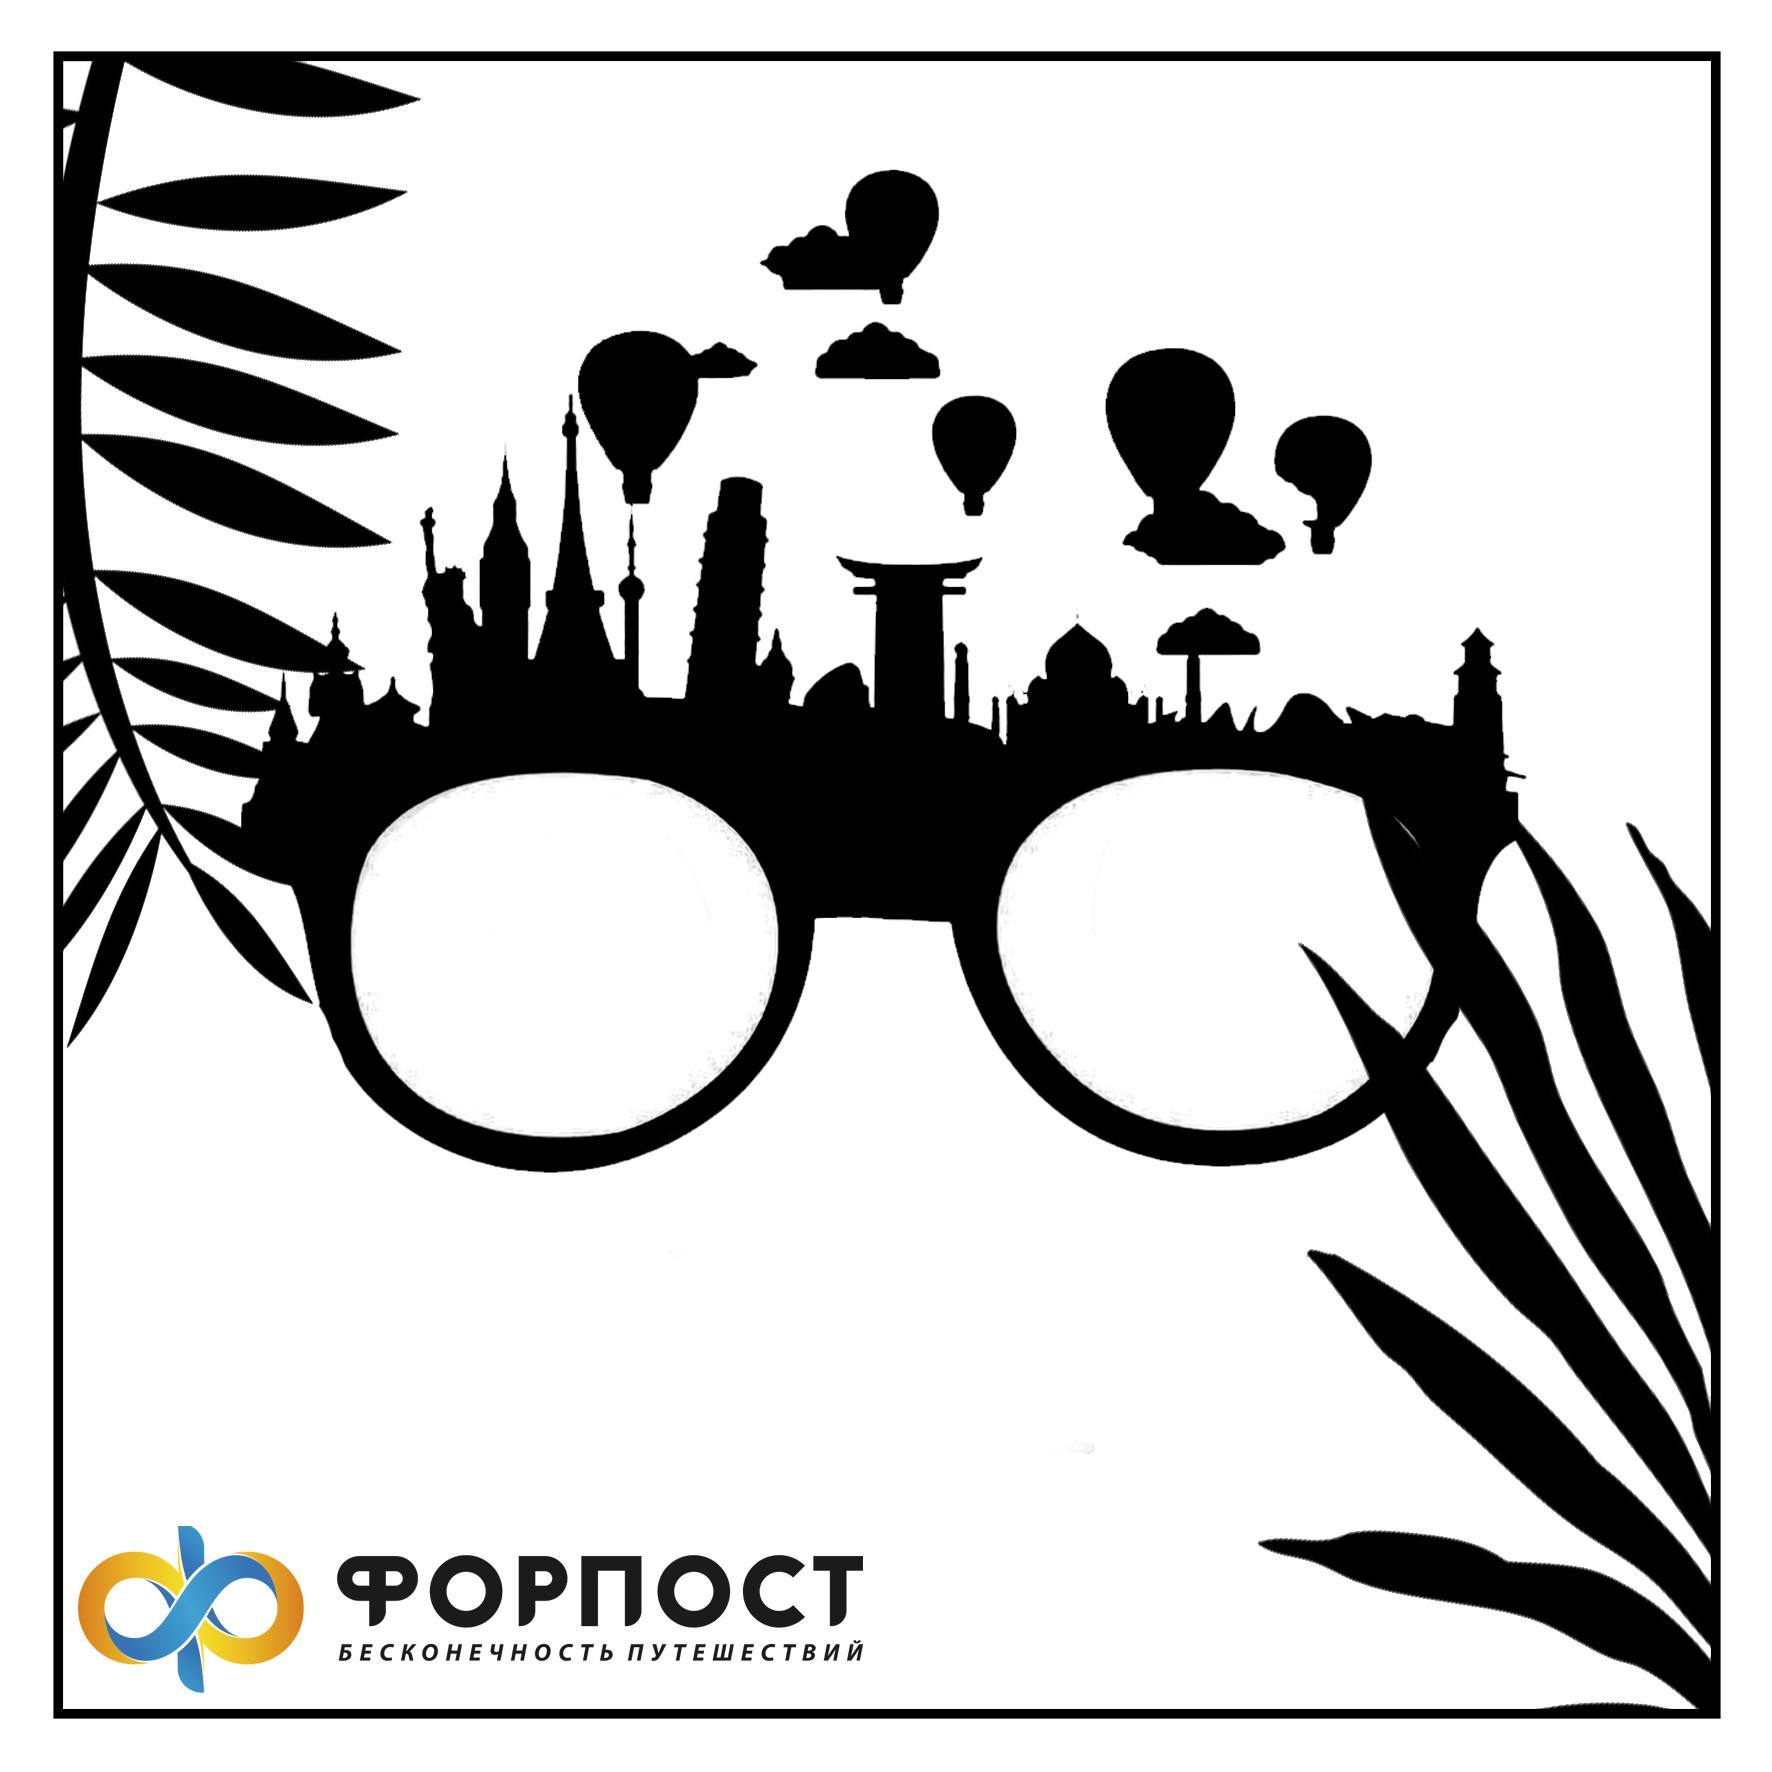 Дизайн флаера на прозрачном пластике фото f_9265ba26d073315a.jpg